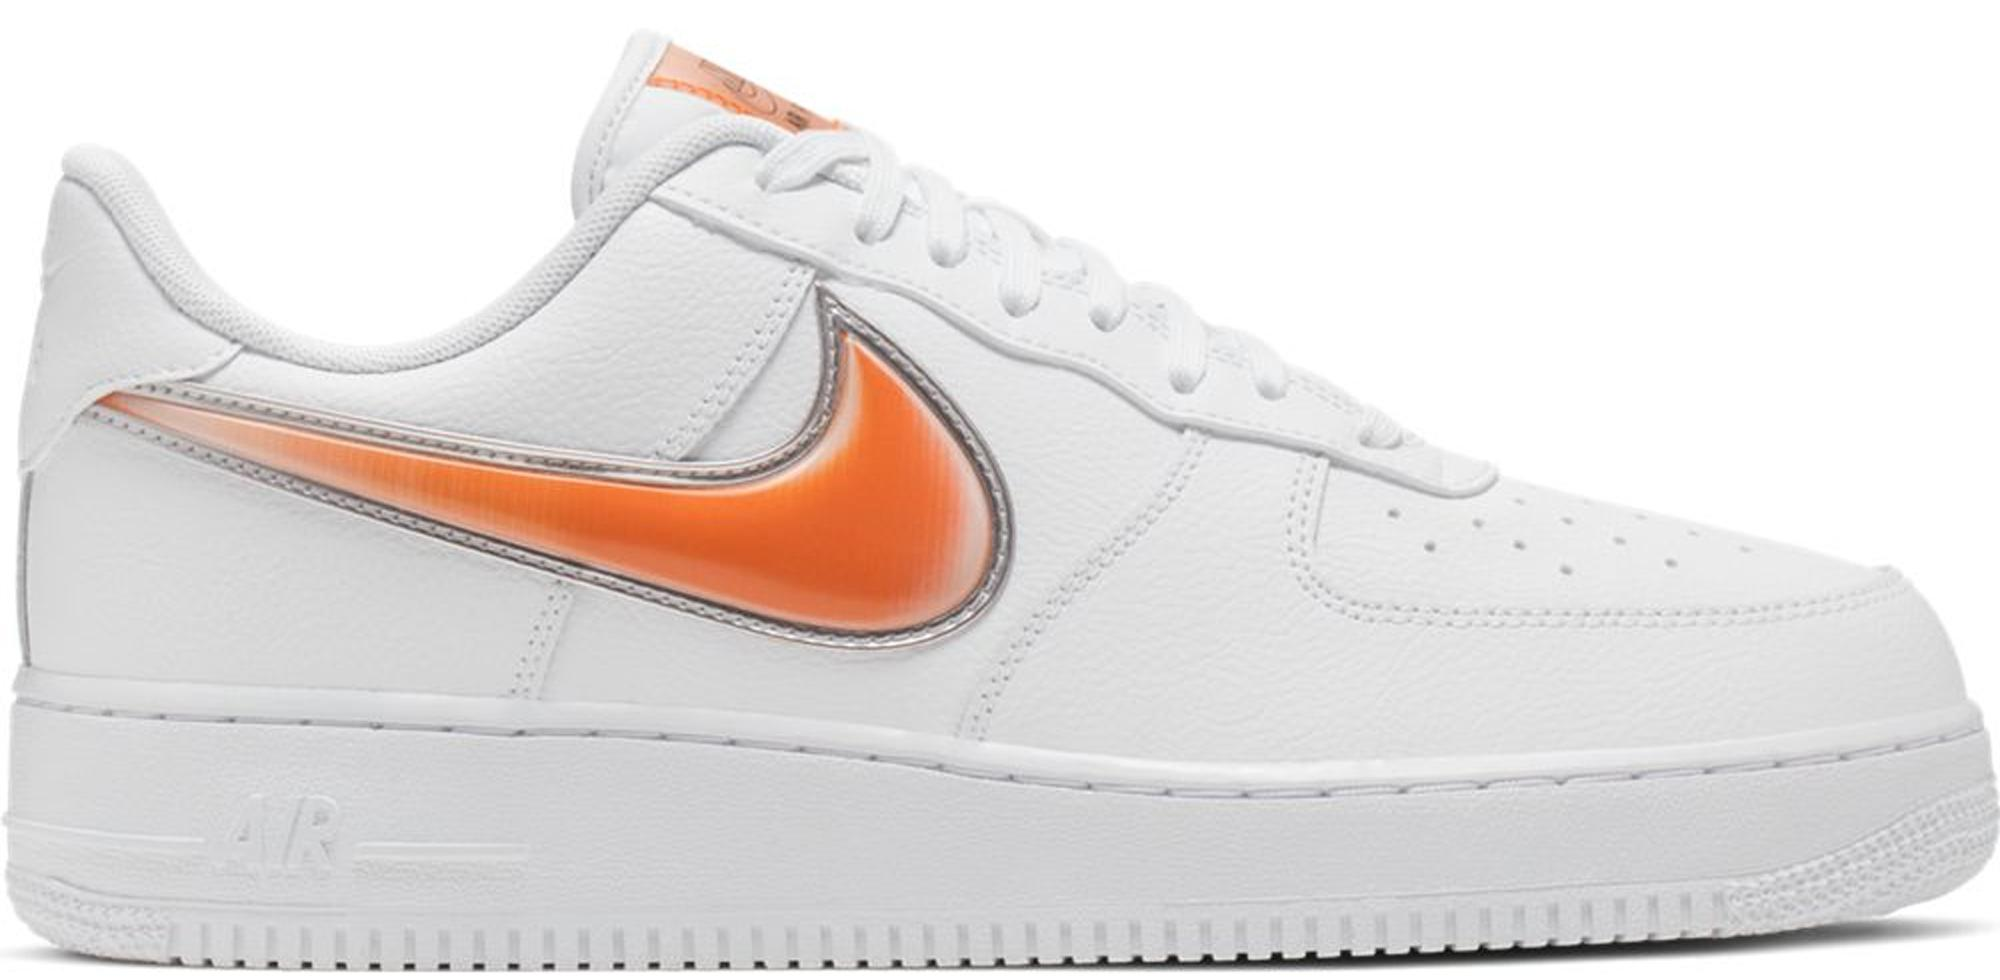 Men's Air Force 1 Low Oversized Swoosh White Orange Peel